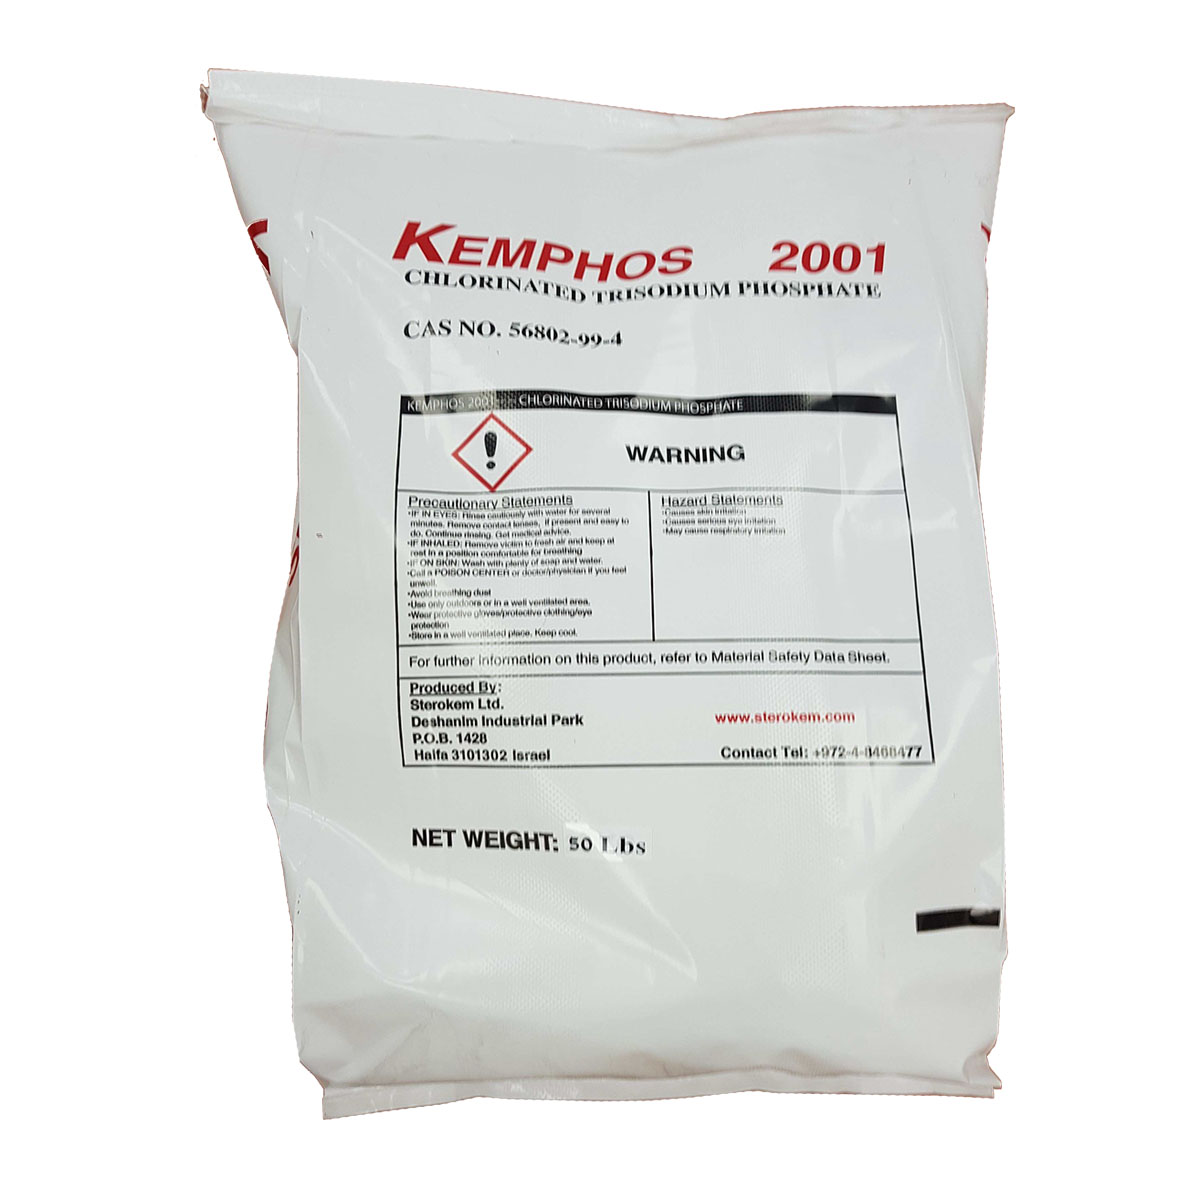 Kemphos 2001